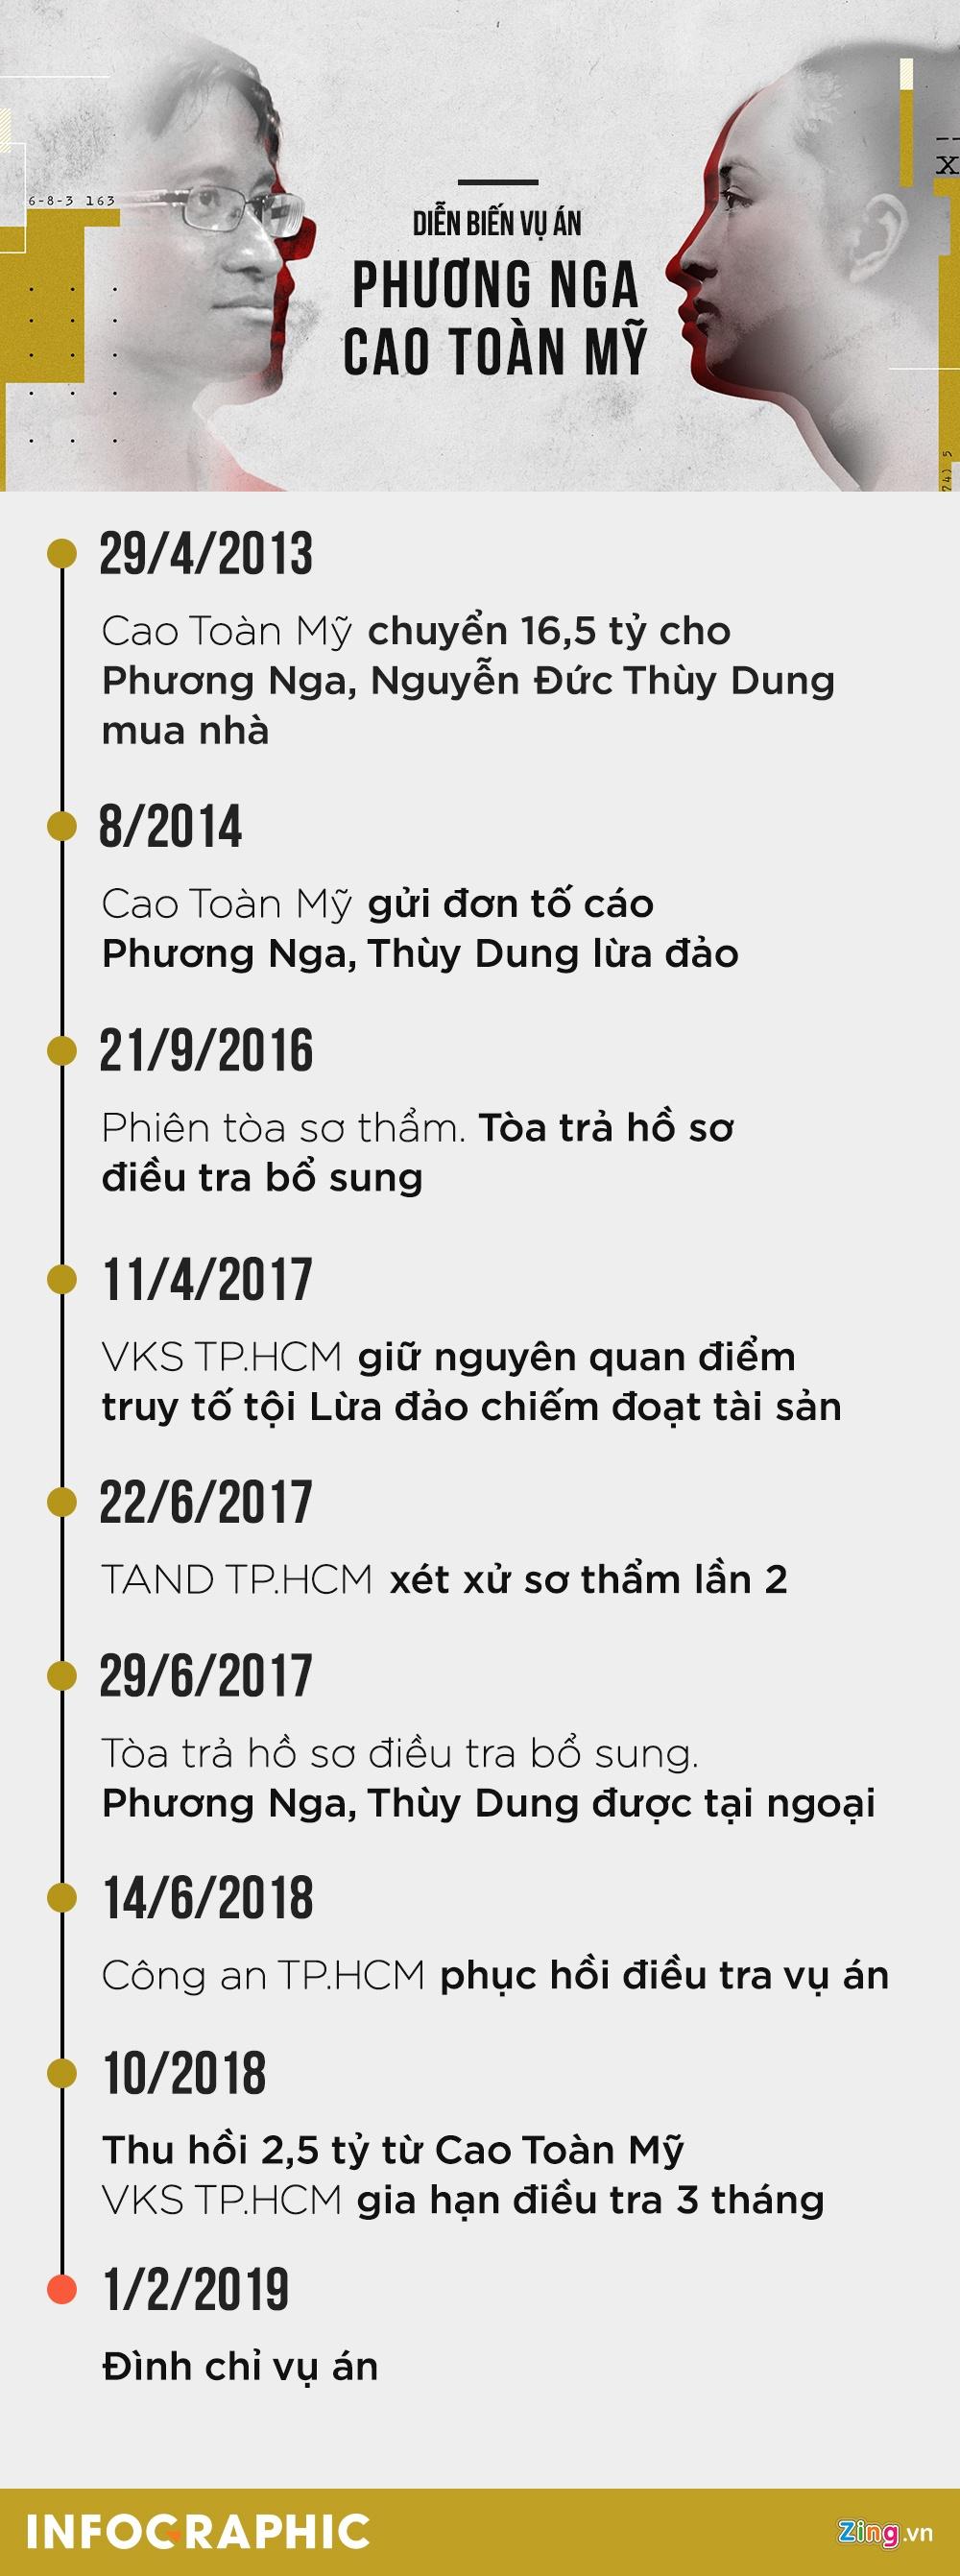 vu Phuong Nga Cao Toan My anh 1